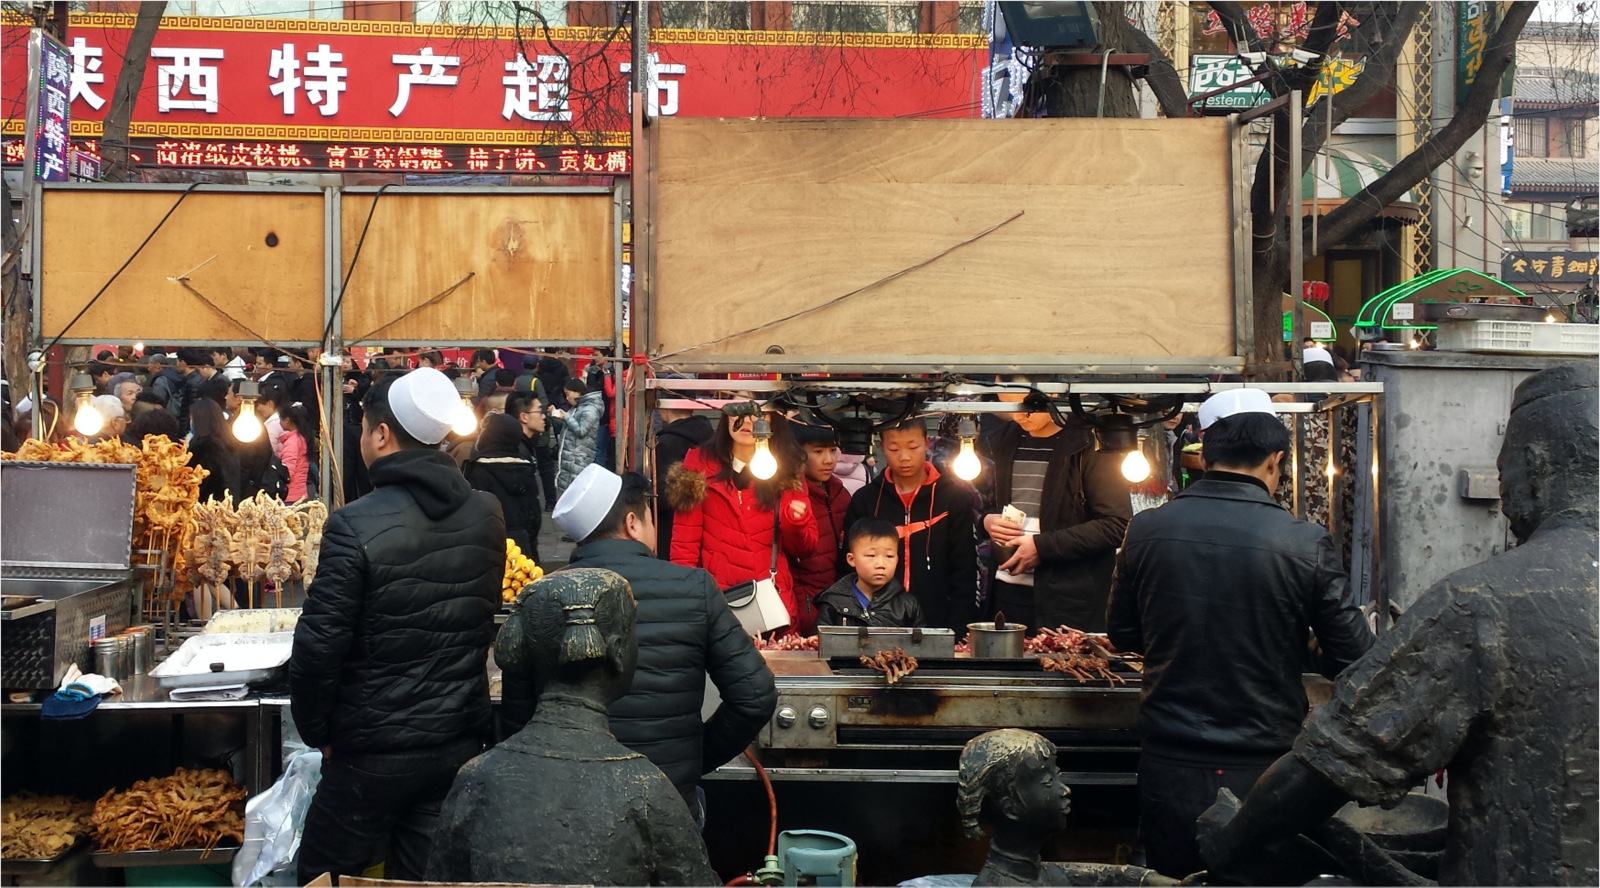 China - XiAn - Muslim street food